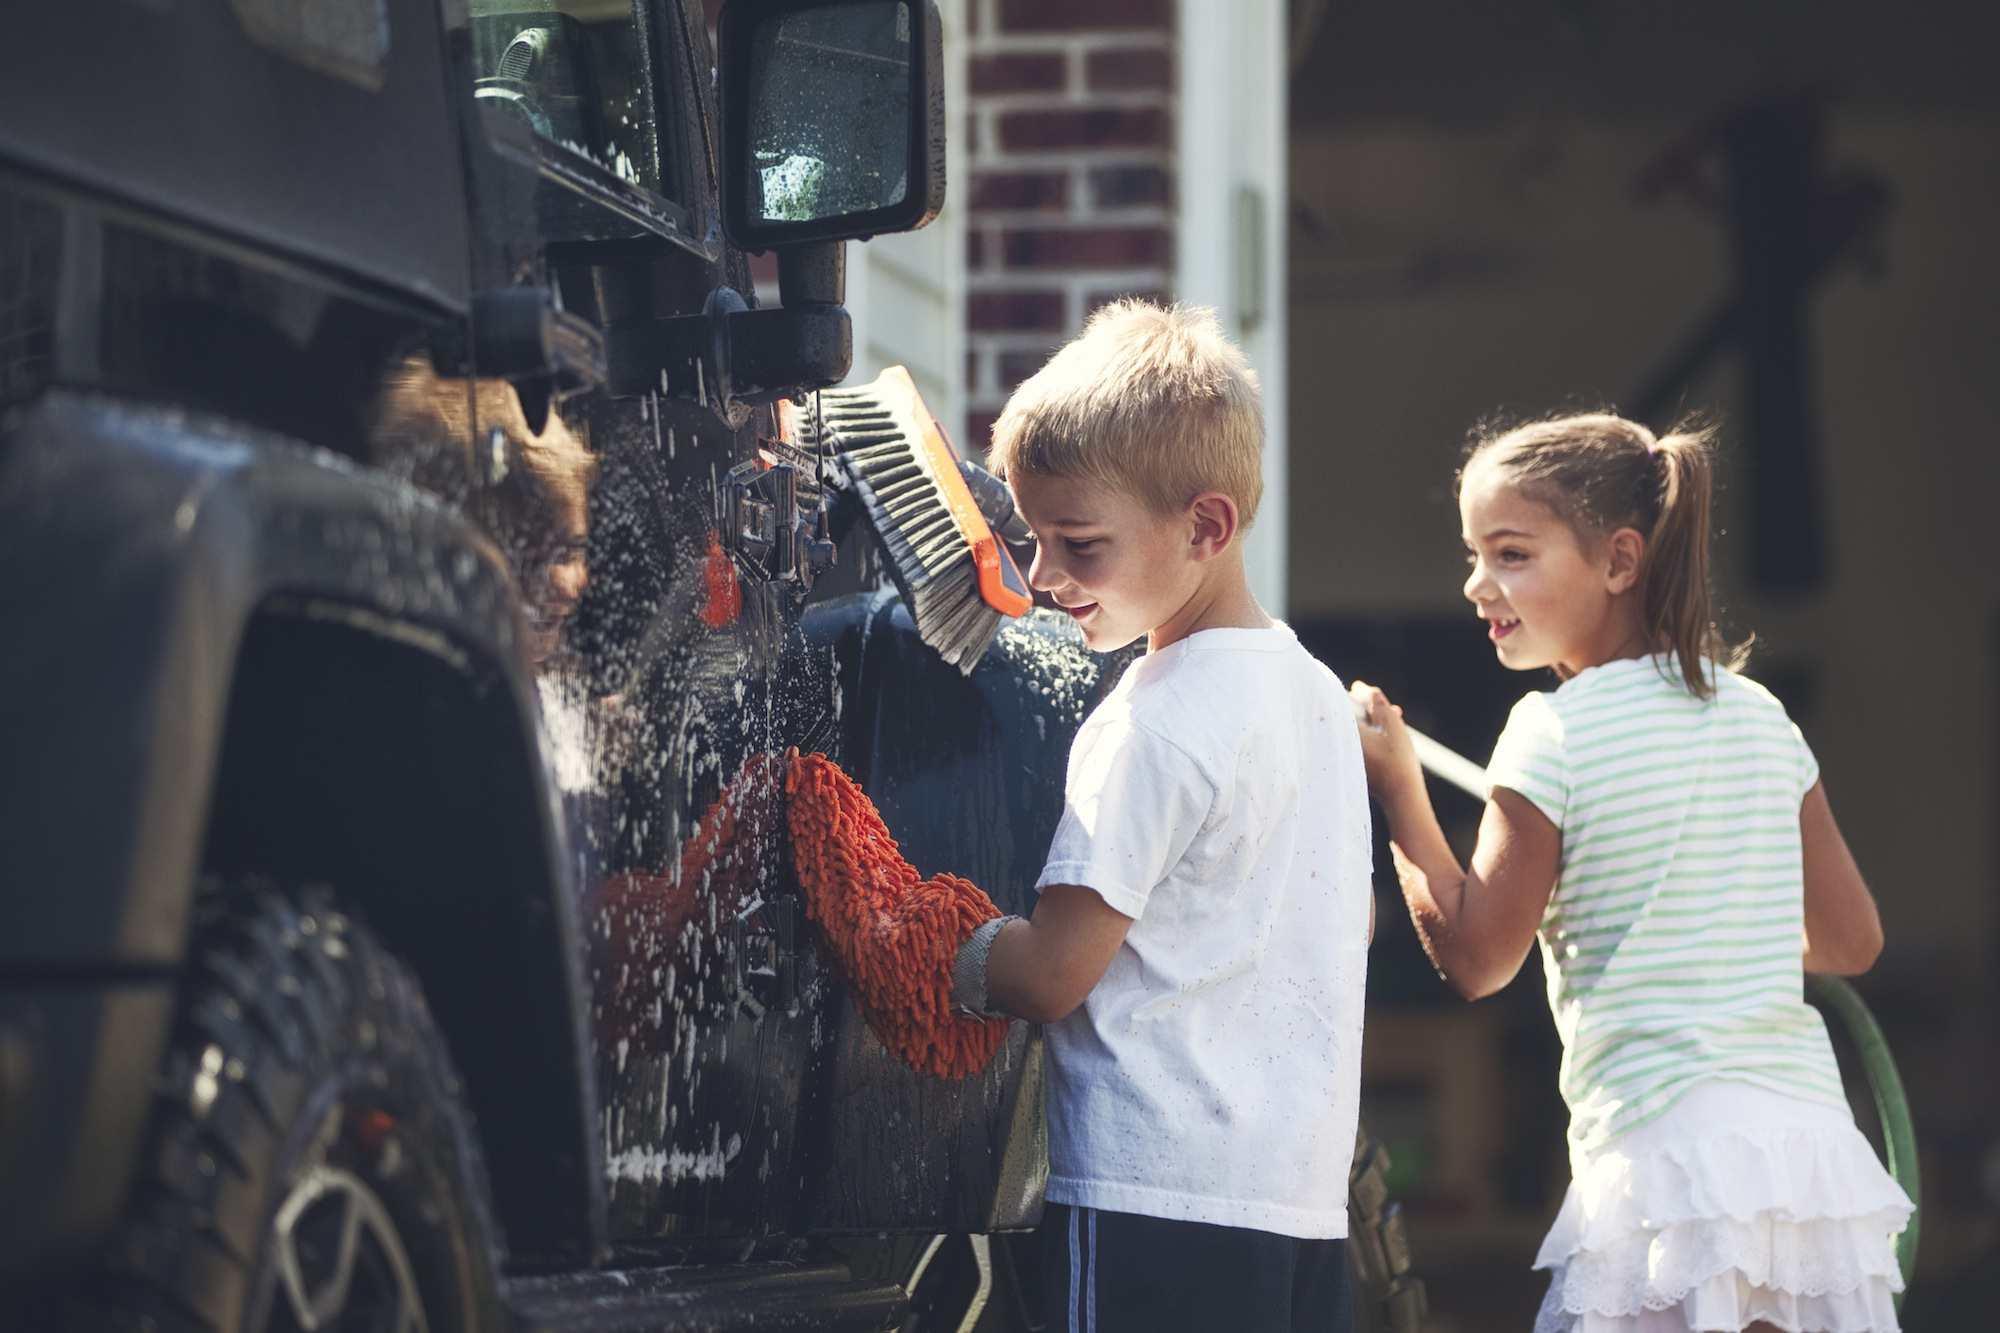 Children washing a car